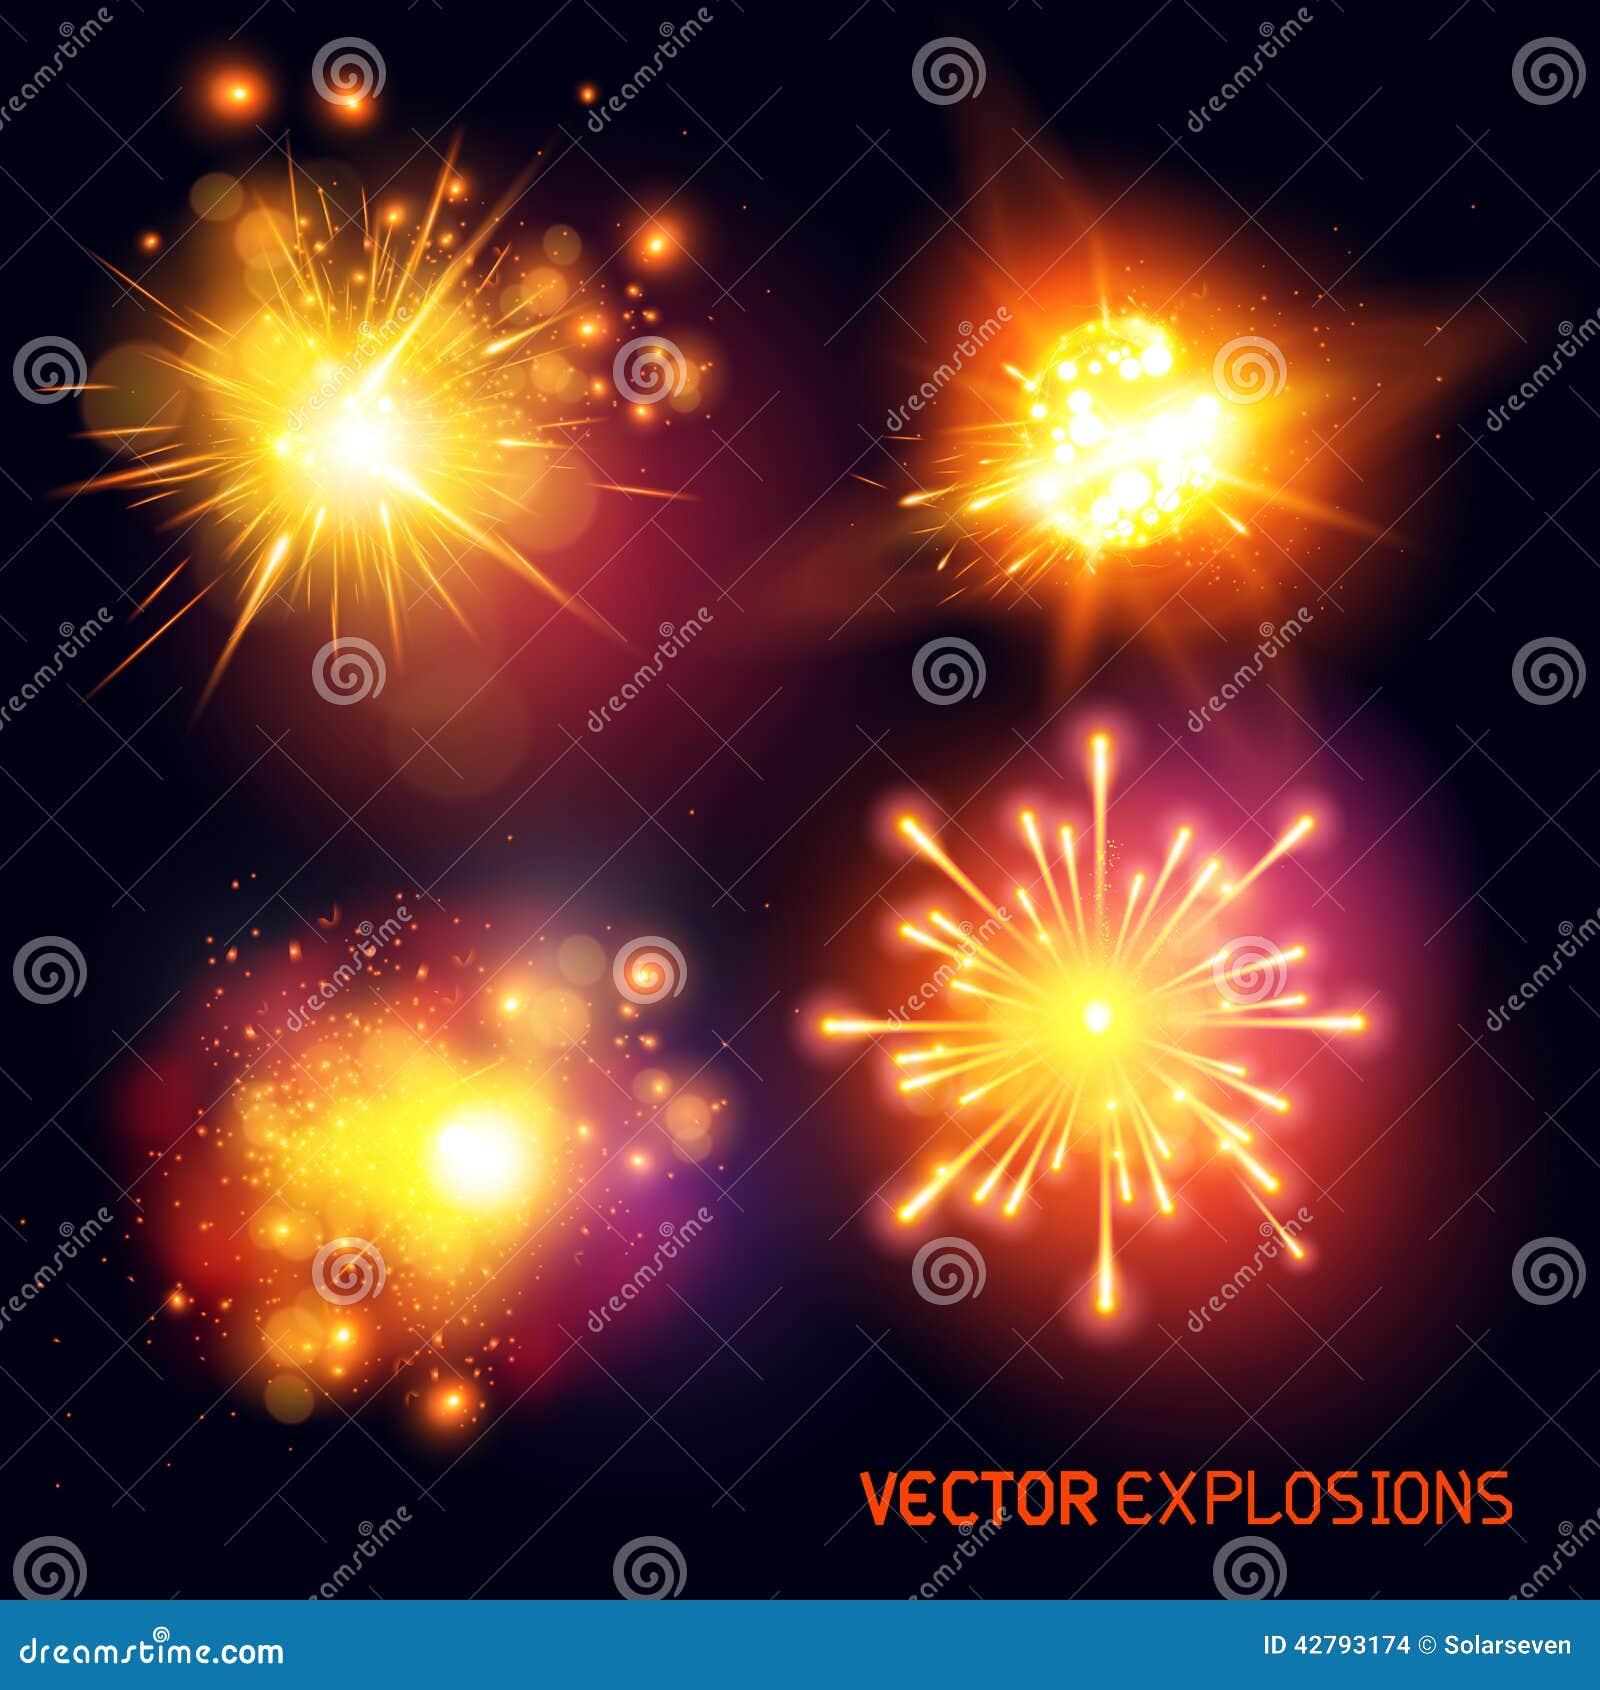 Vector Explosions